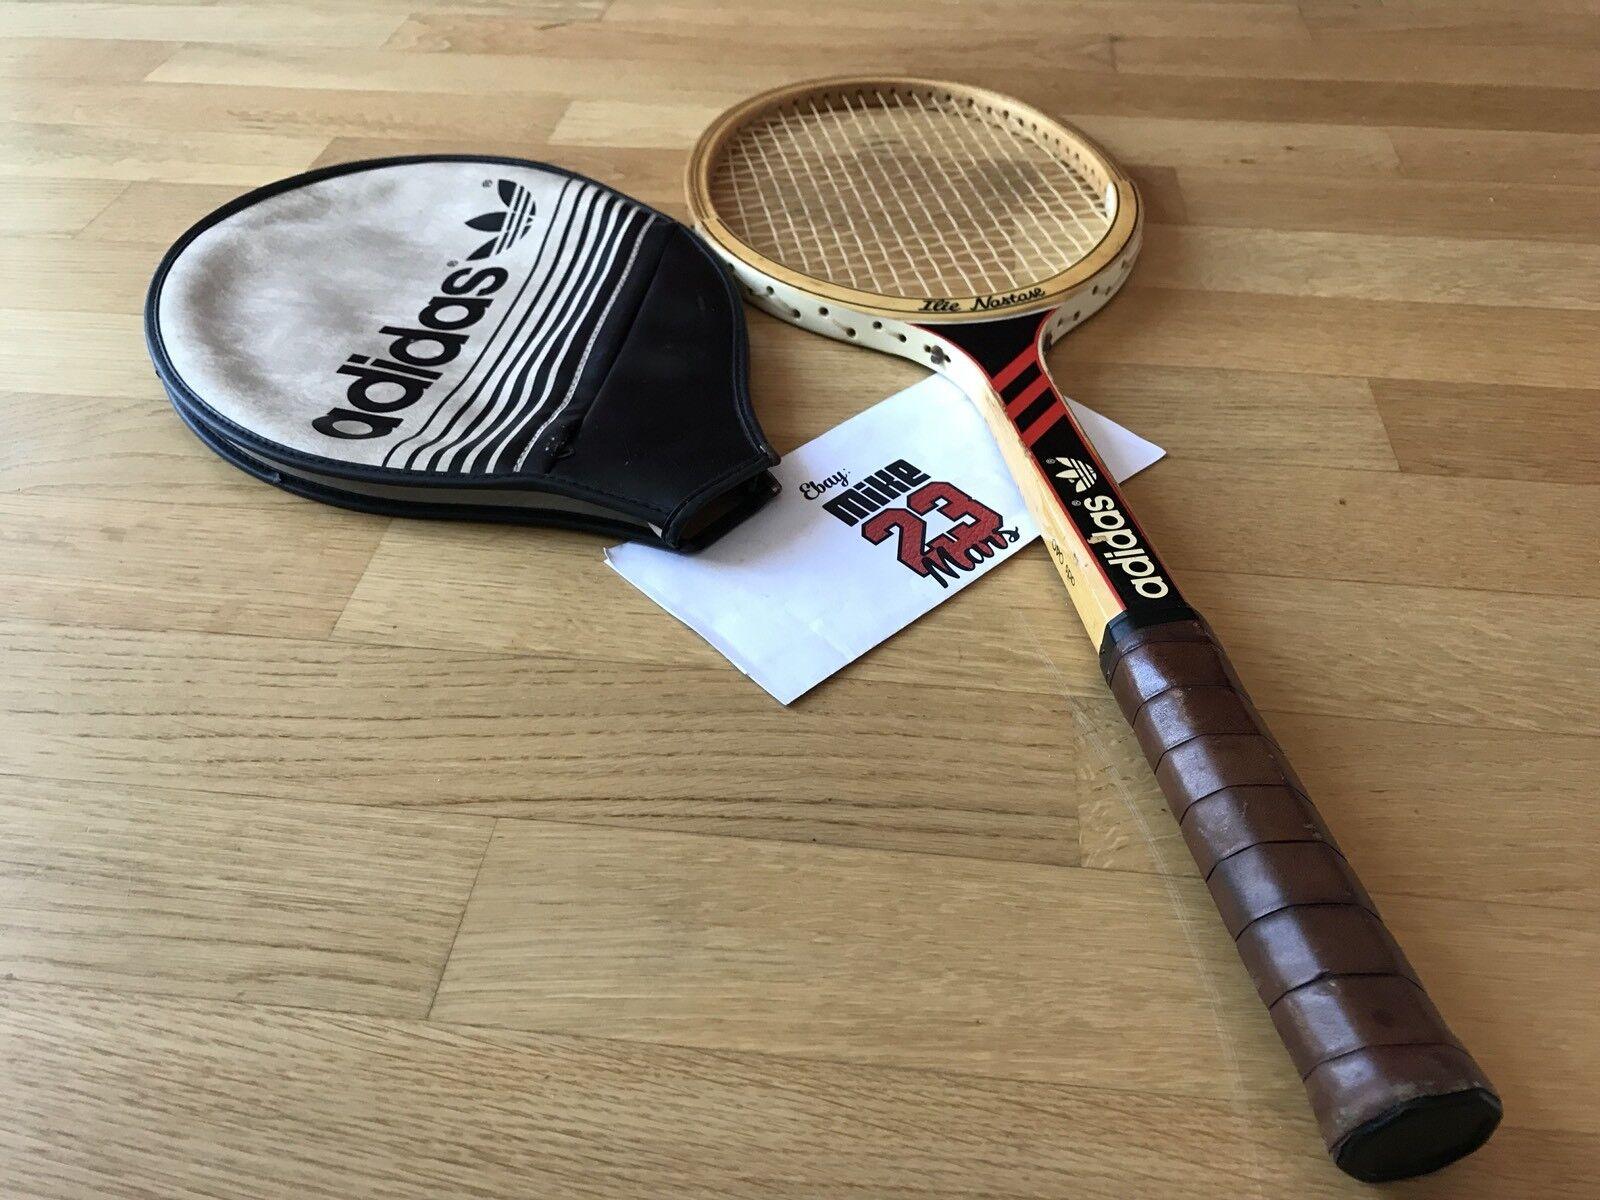 Raquette de tennis en bois Vintage Adidas Ilie Nastase de 1970 Yeezy Nmd Boost